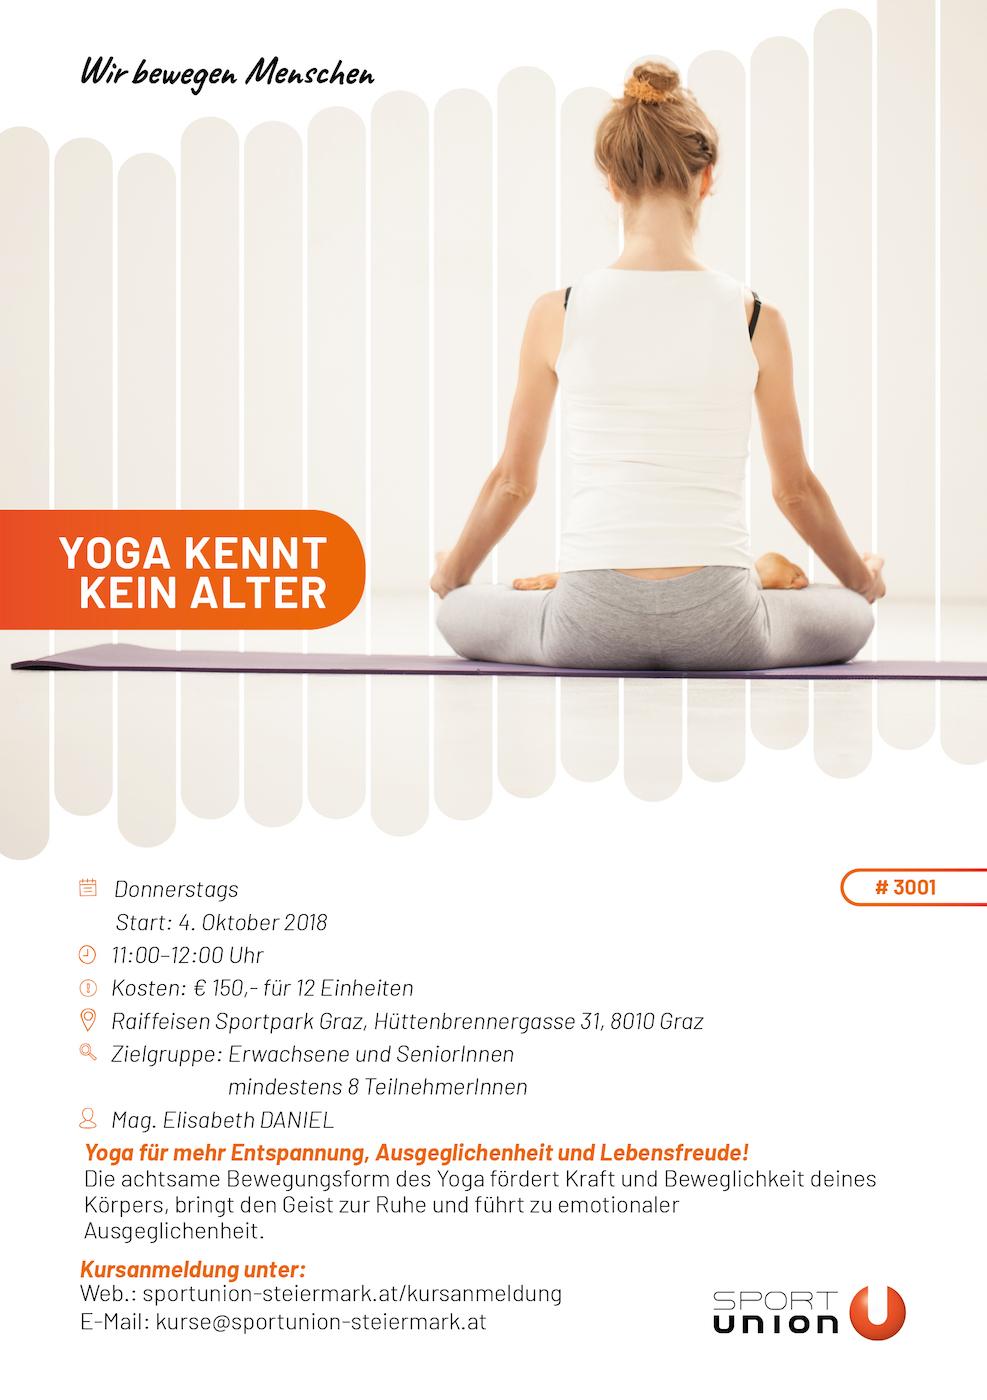 Yoga - Raiffeisen Sportpark